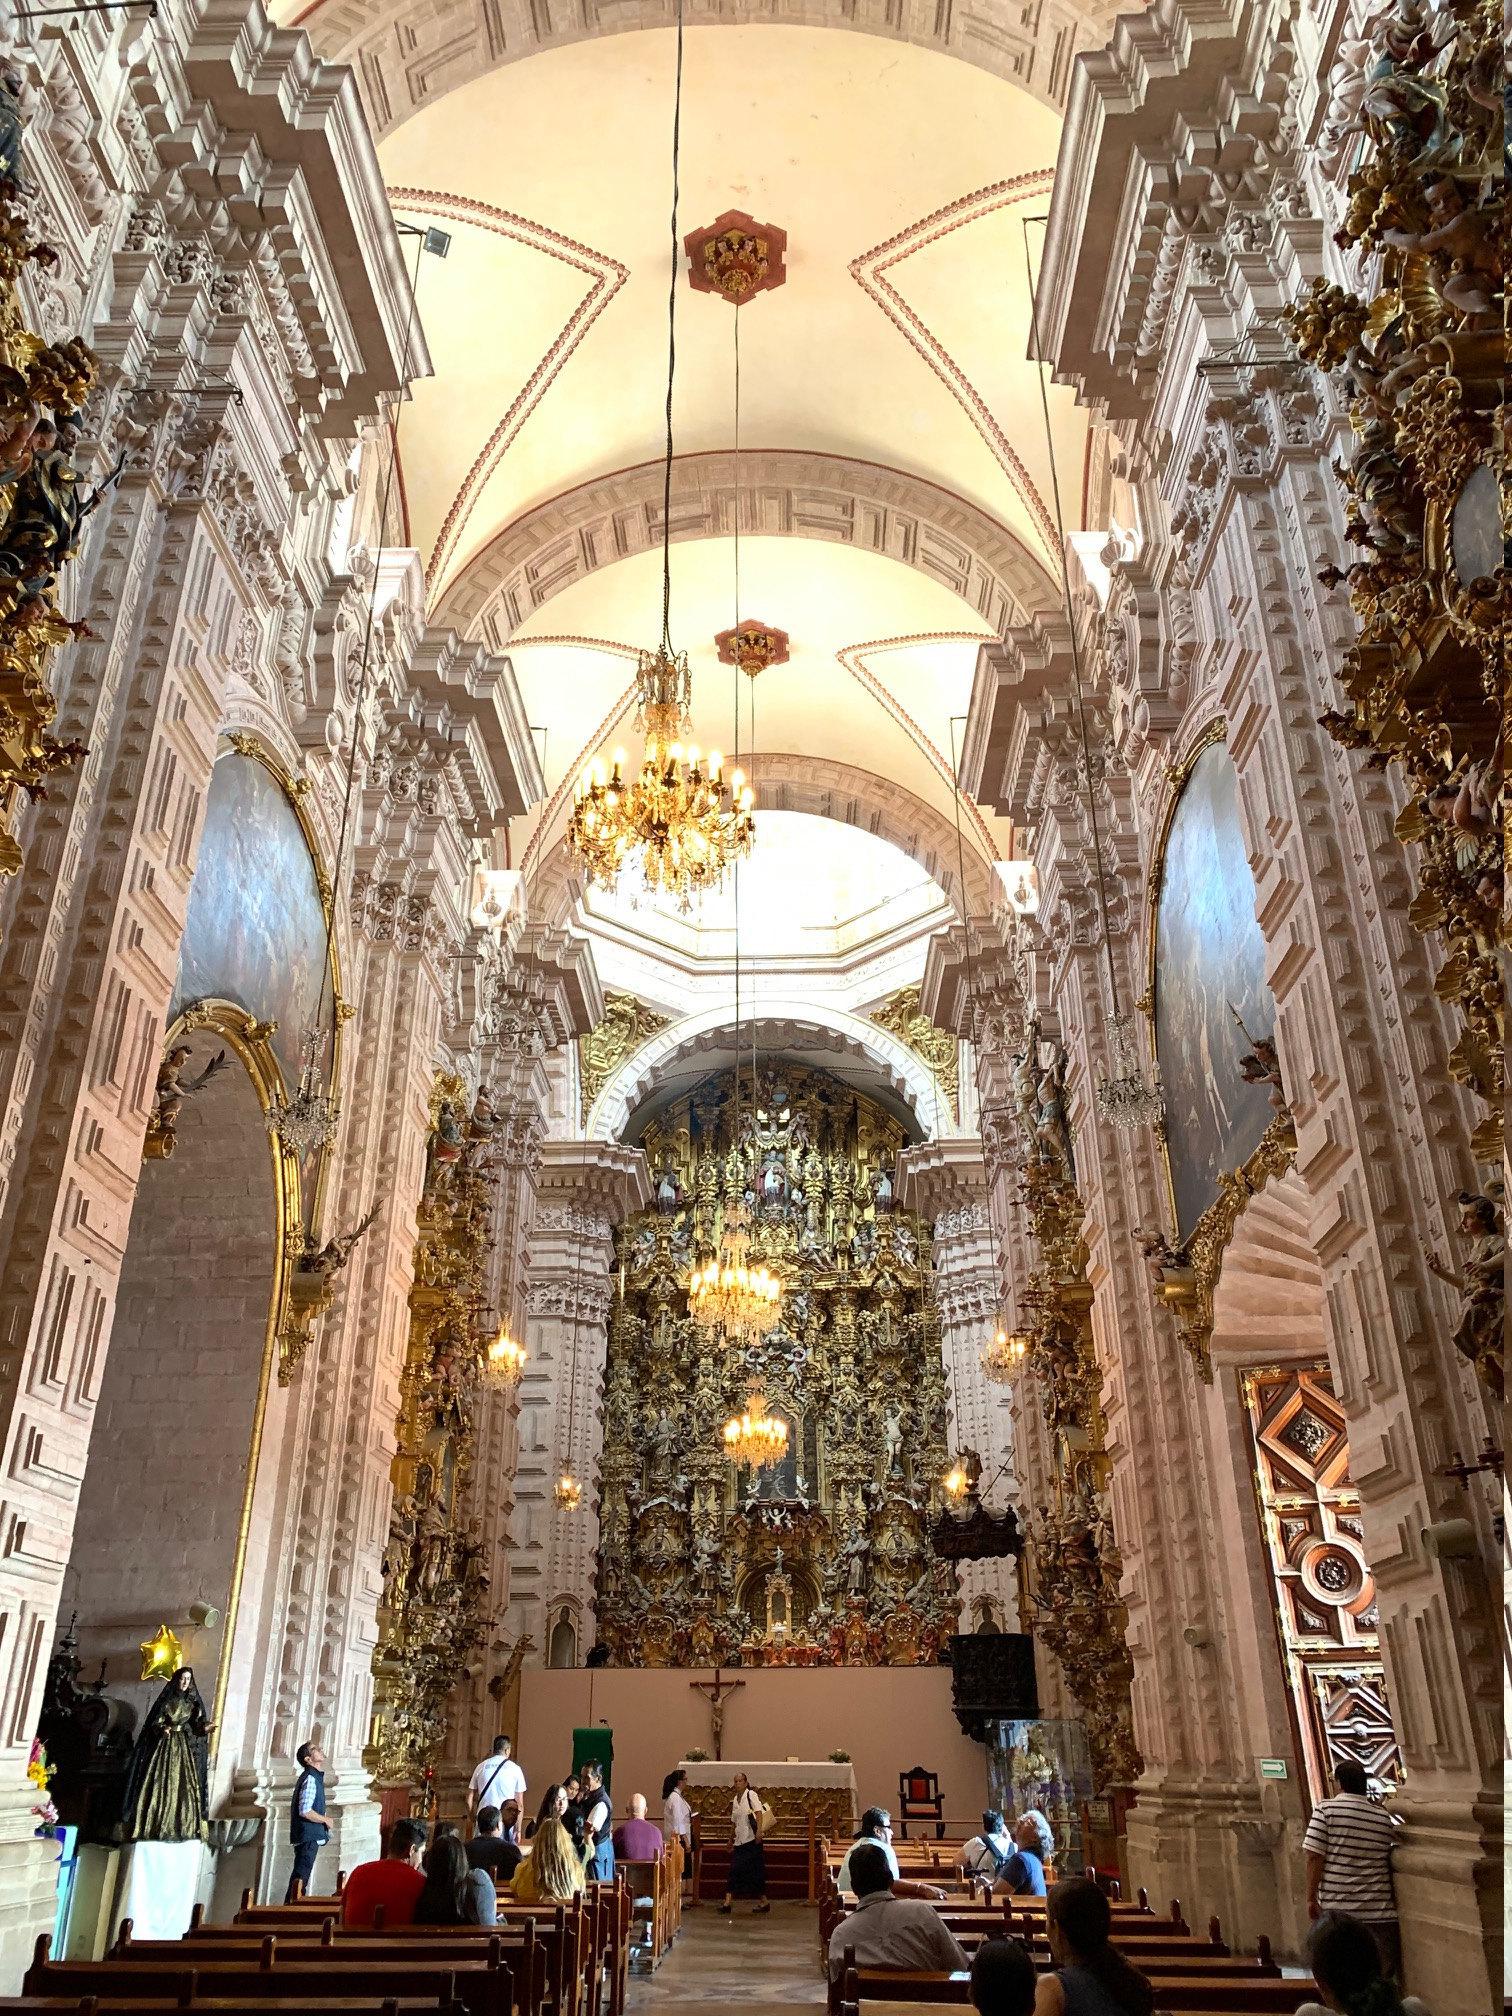 iglesia católica, catholic church, Mexican church, Iglesia, Catedral Santa Prisca, escapulario devocional; devotional Scapular; faith, god is god